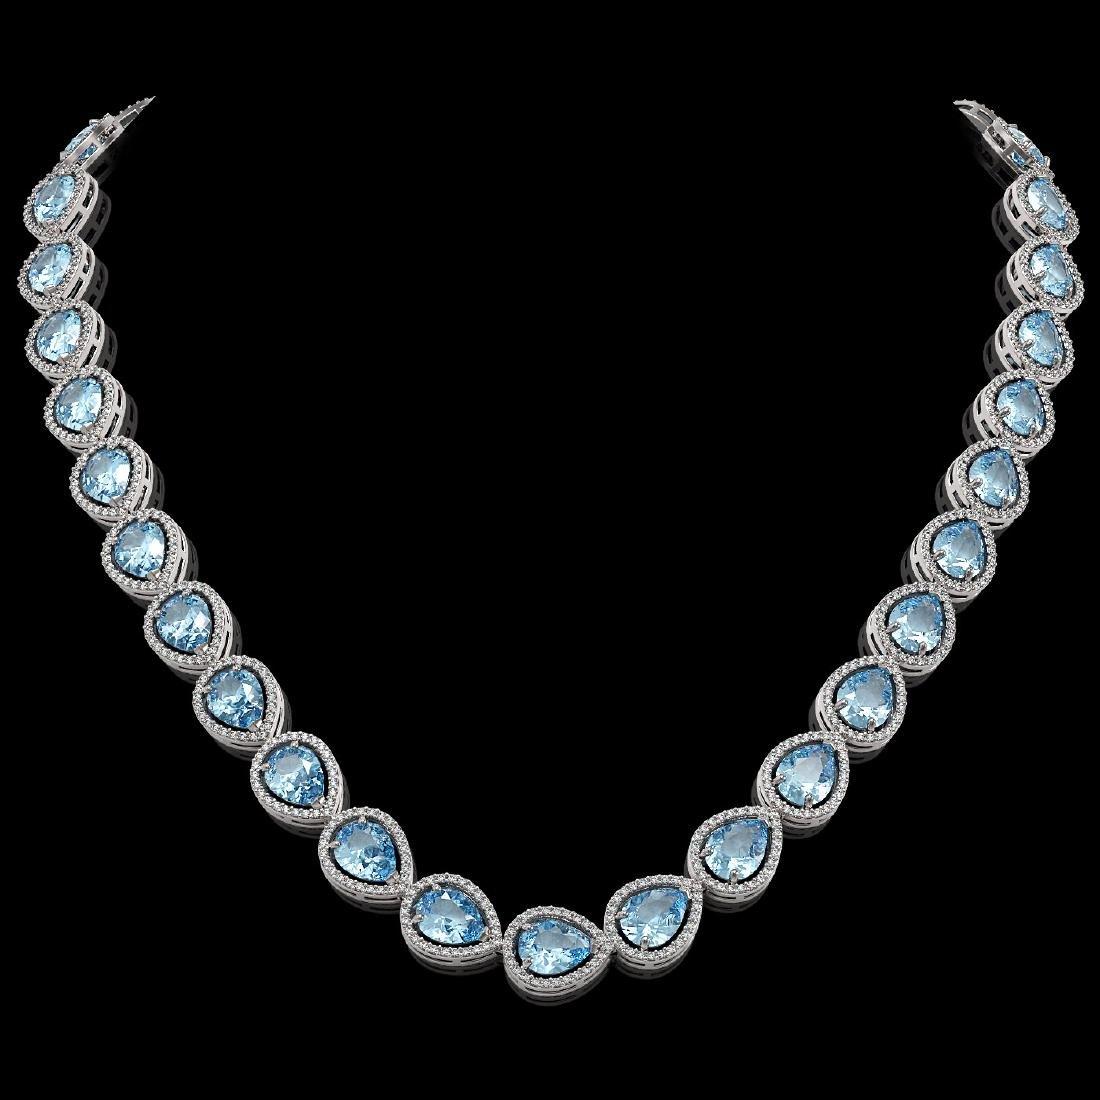 41.6 CTW Aquamarine & Diamond Halo Necklace 10K White